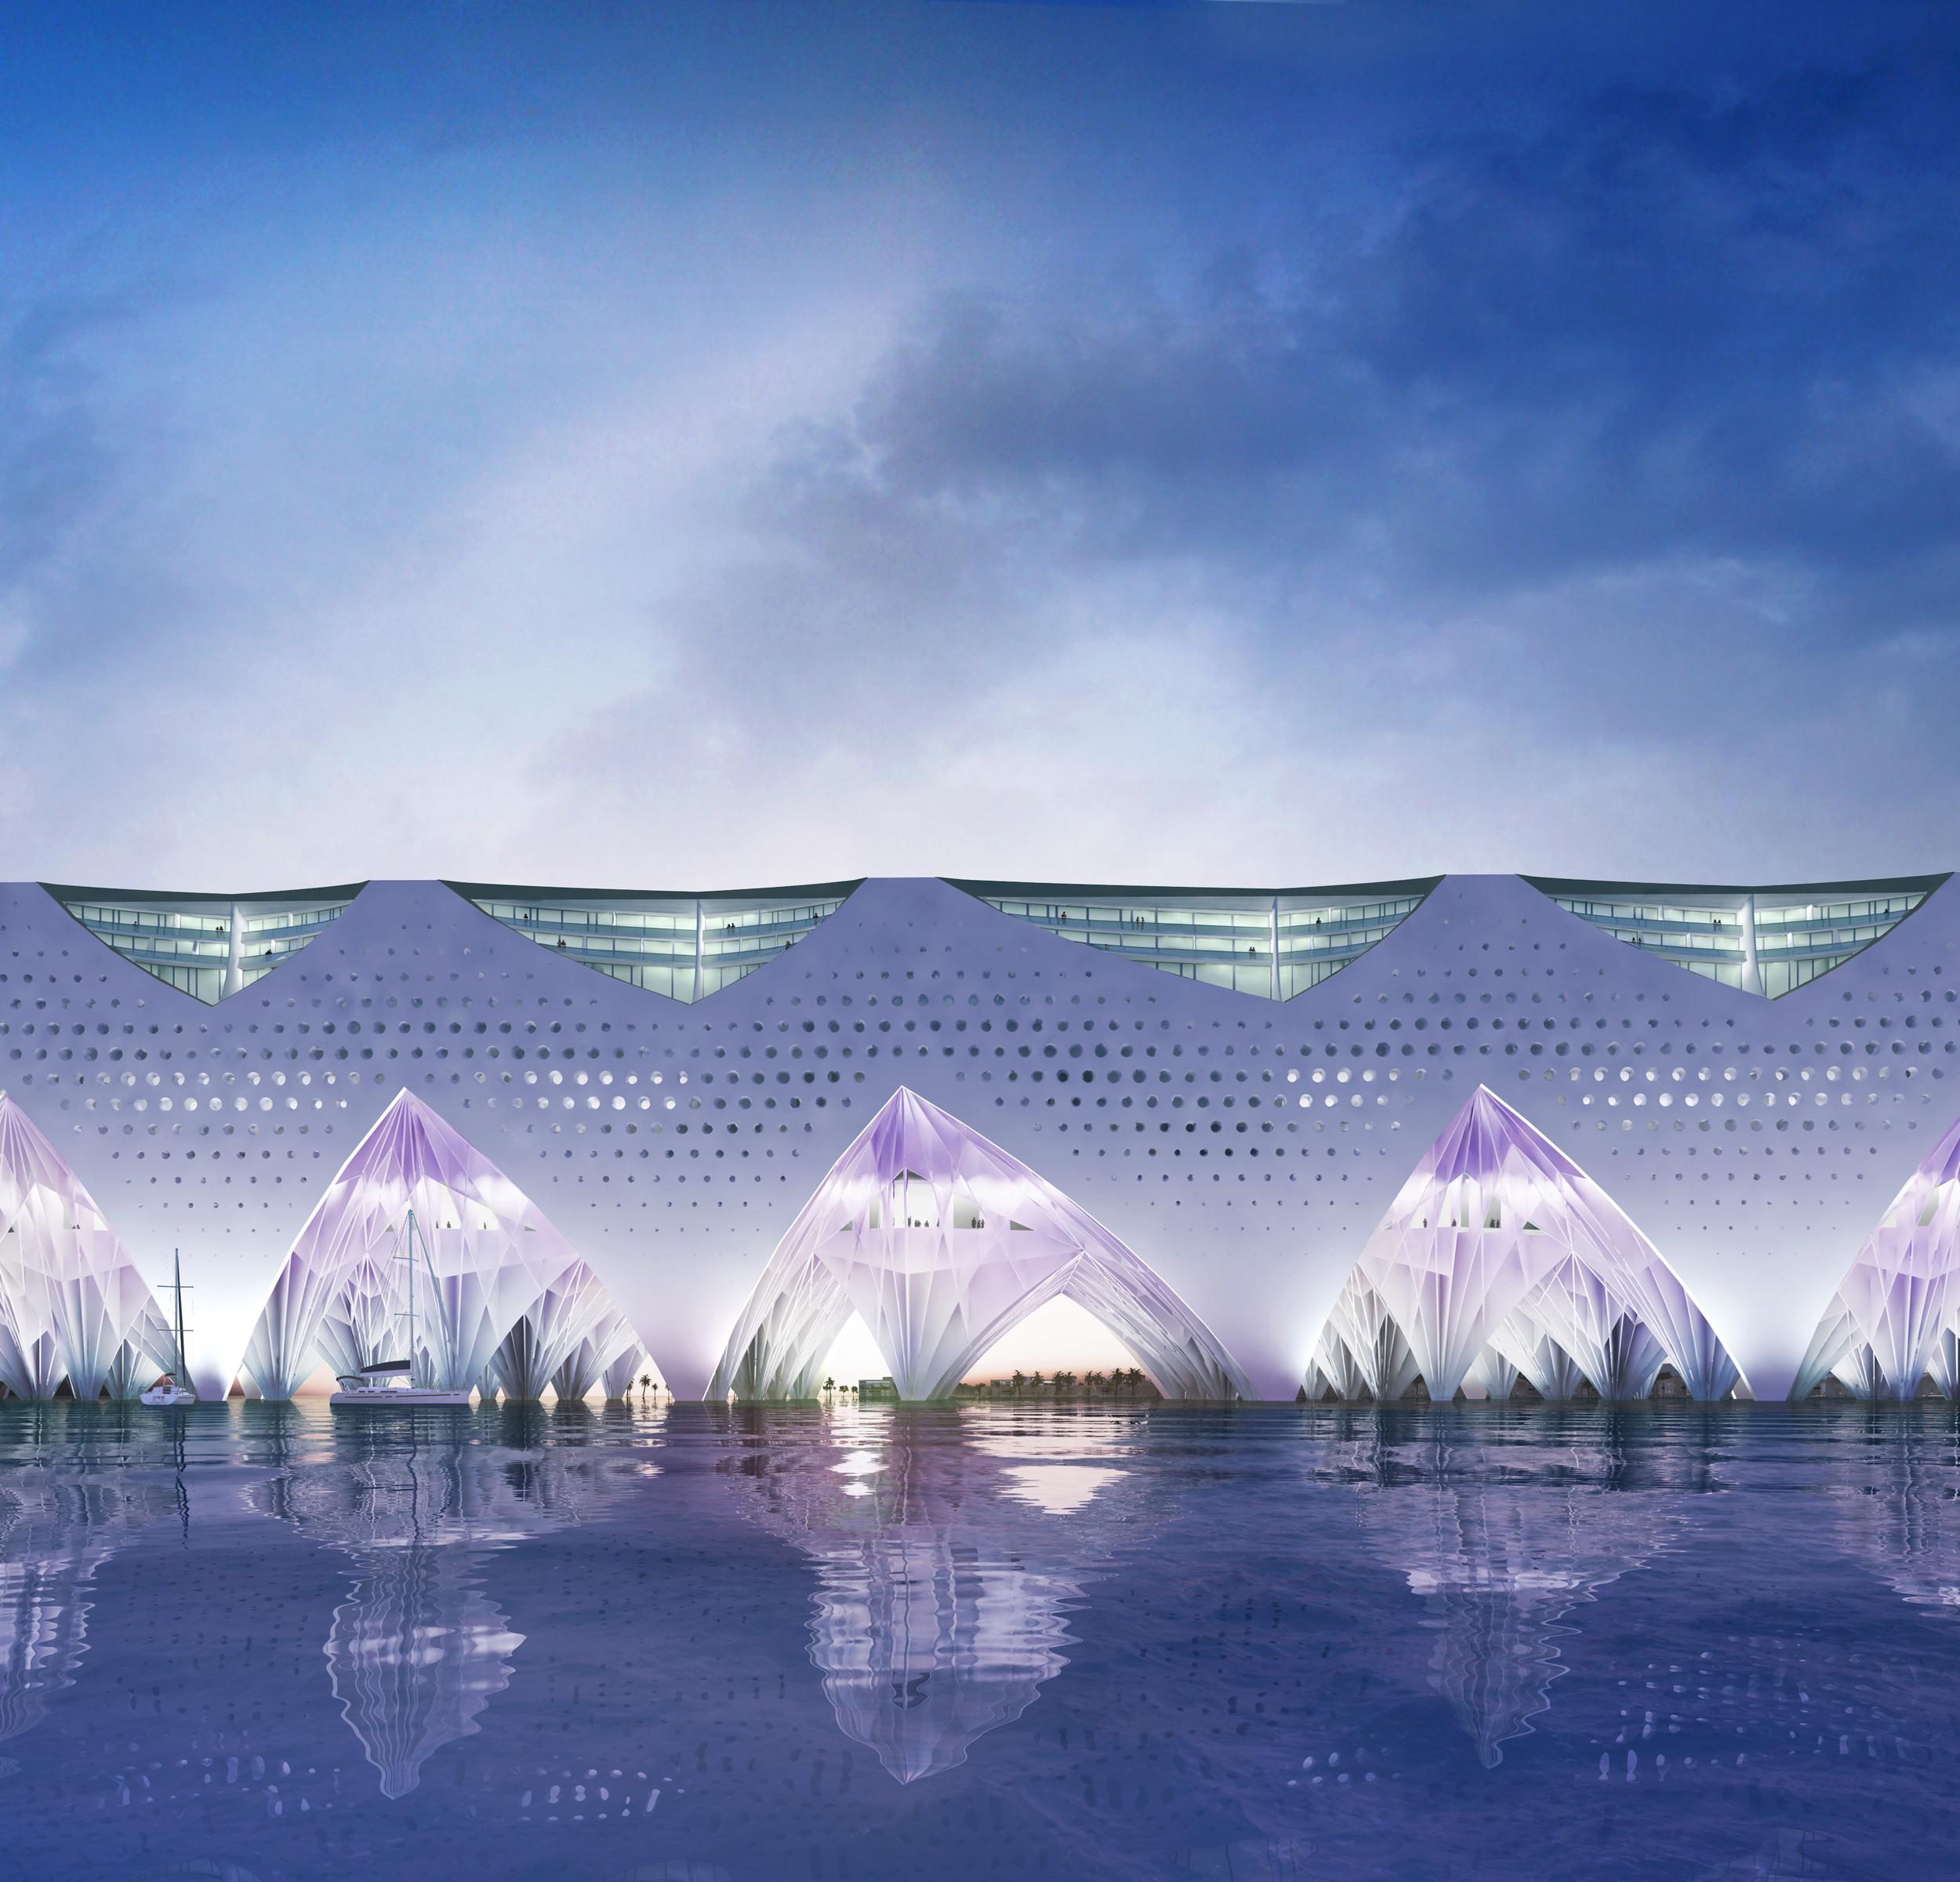 brt - water palace abu dhabi_04.jpg